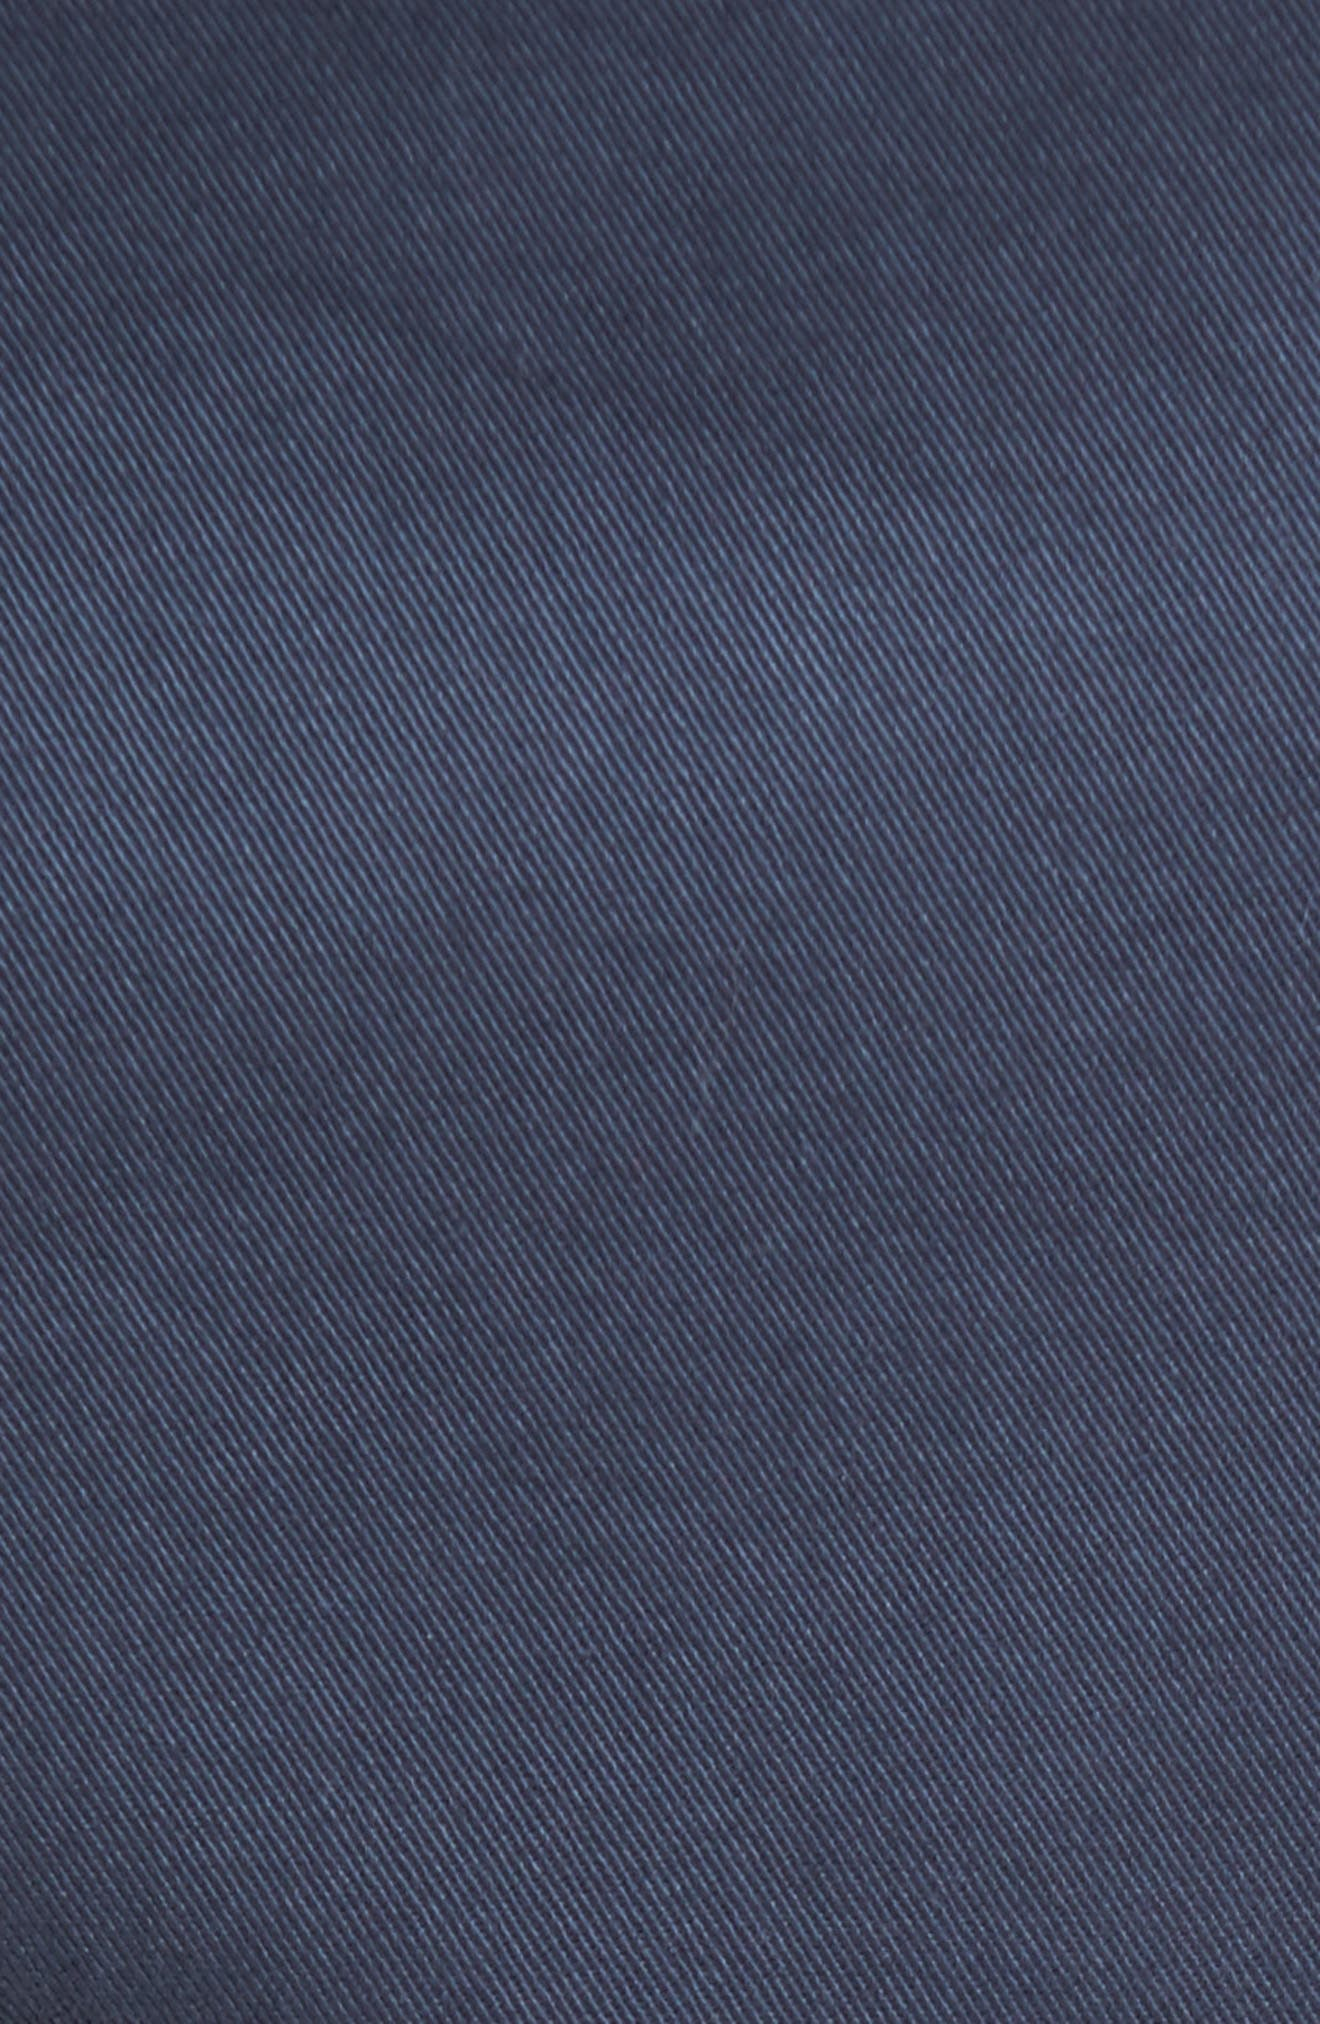 Washed Shorts,                             Alternate thumbnail 27, color,